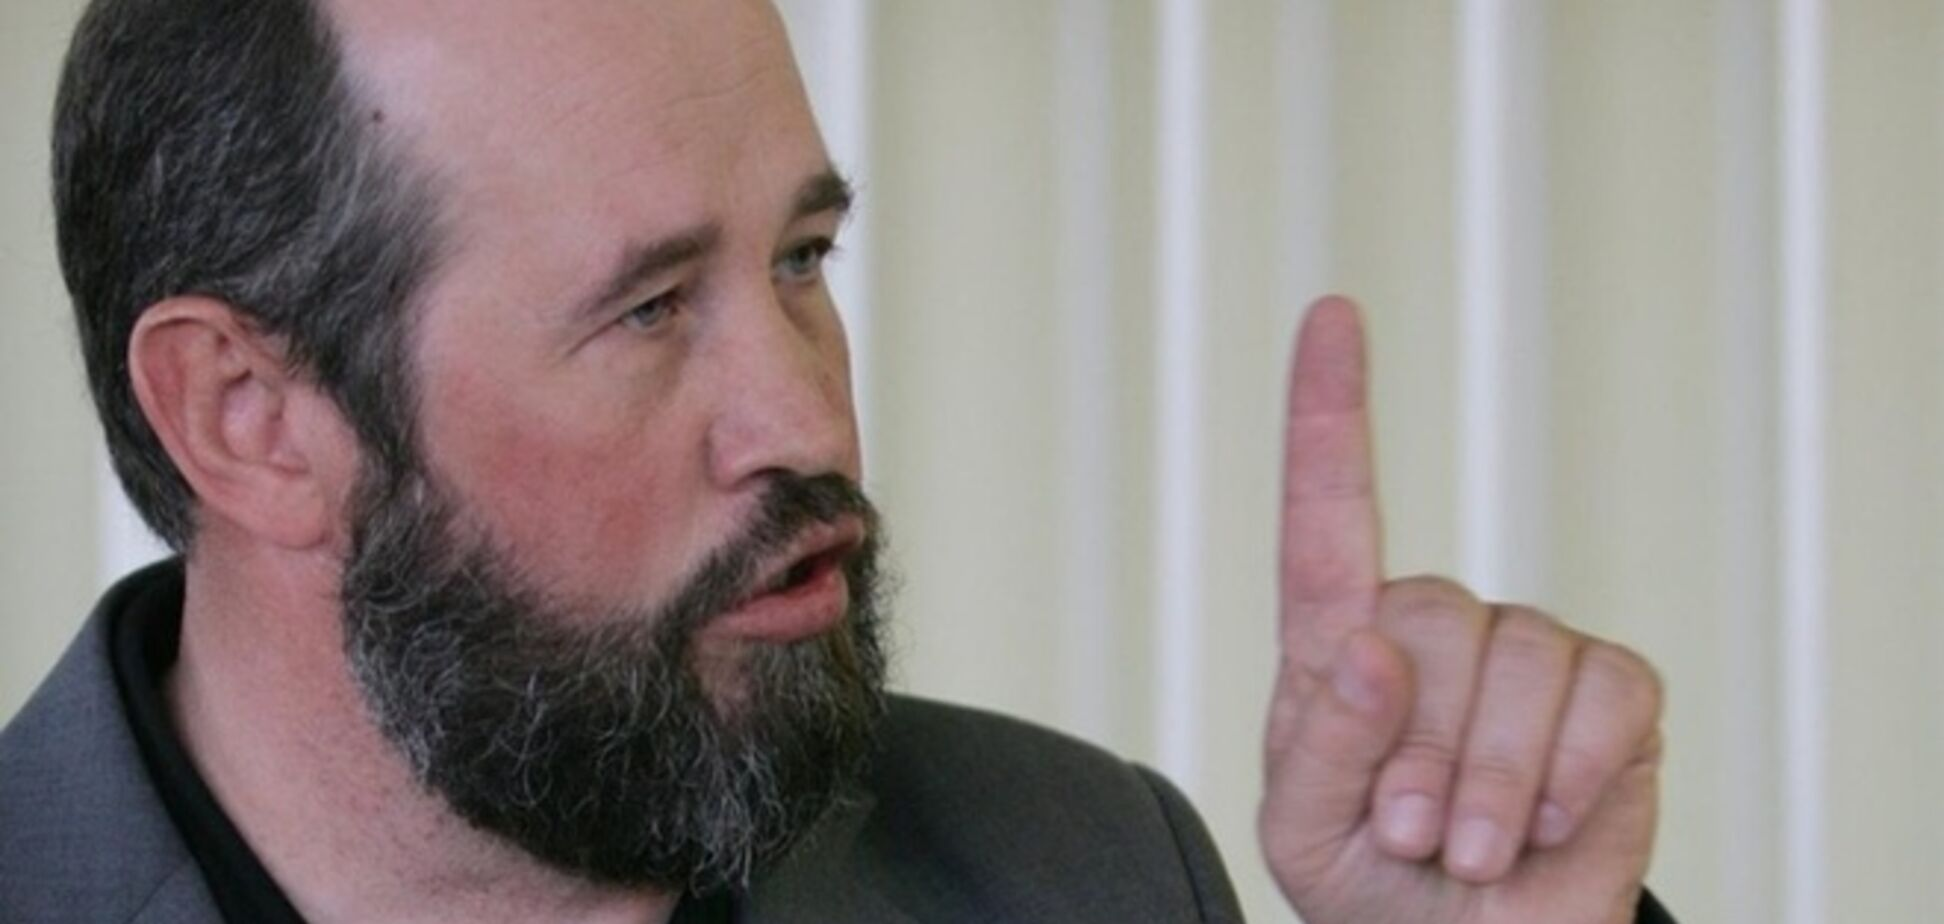 Адвокат Федур: дело против Рената Кузьмина – 'бред сумасшедшего'